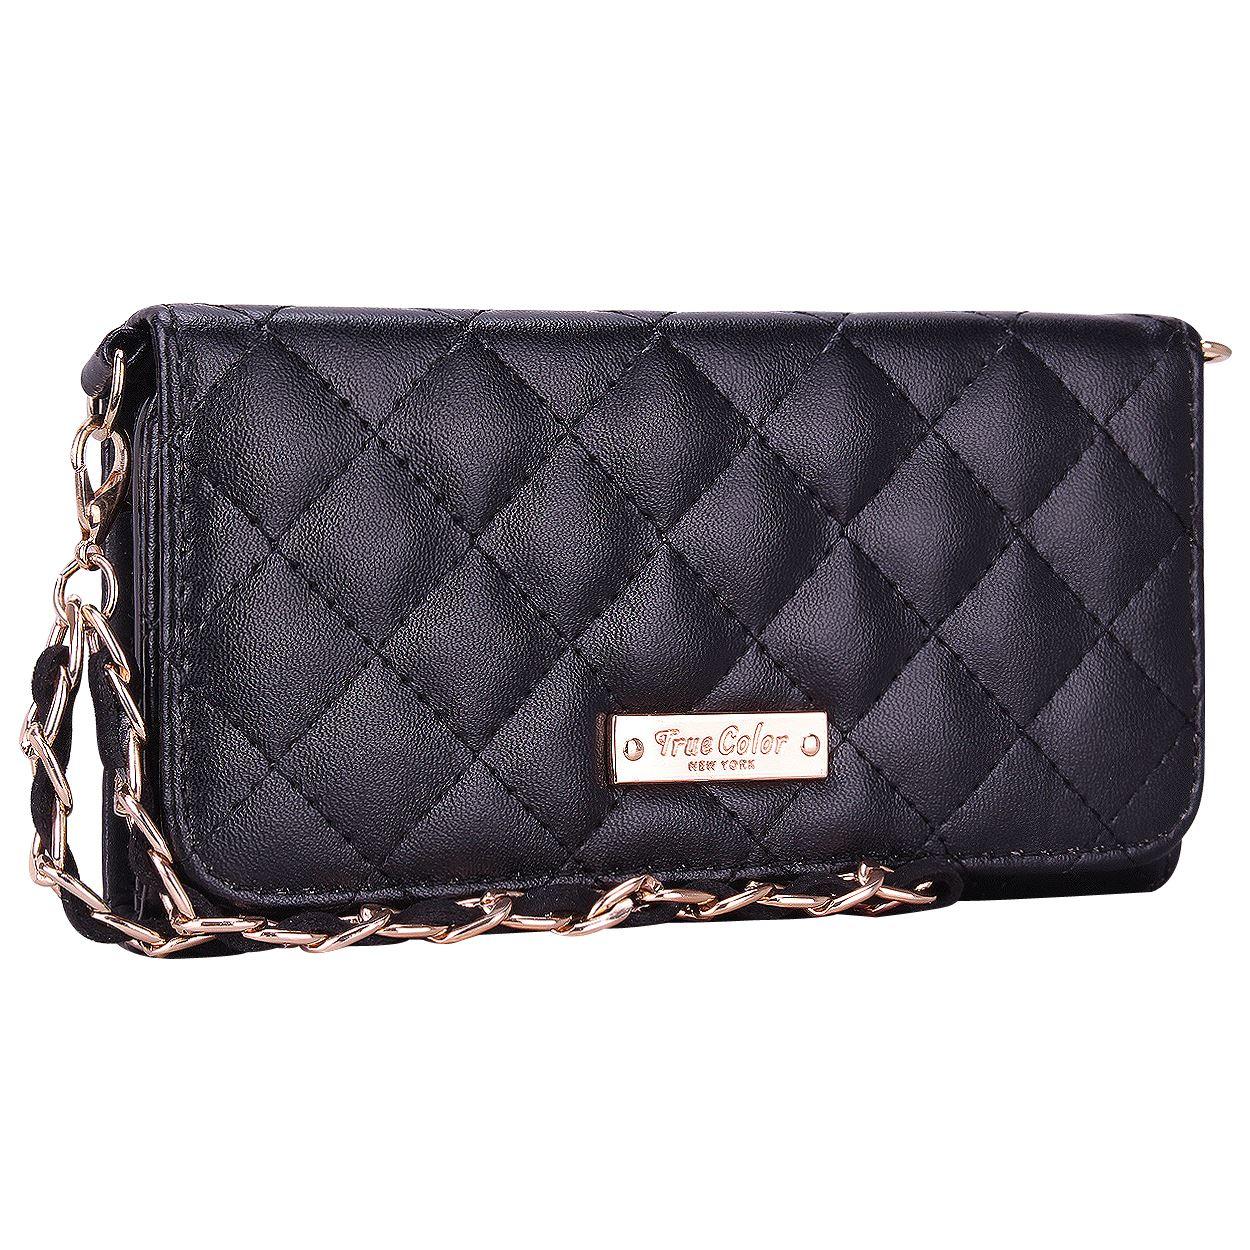 True Color 174 Premium Designer Iphone 6 Wristlet Wallet Case